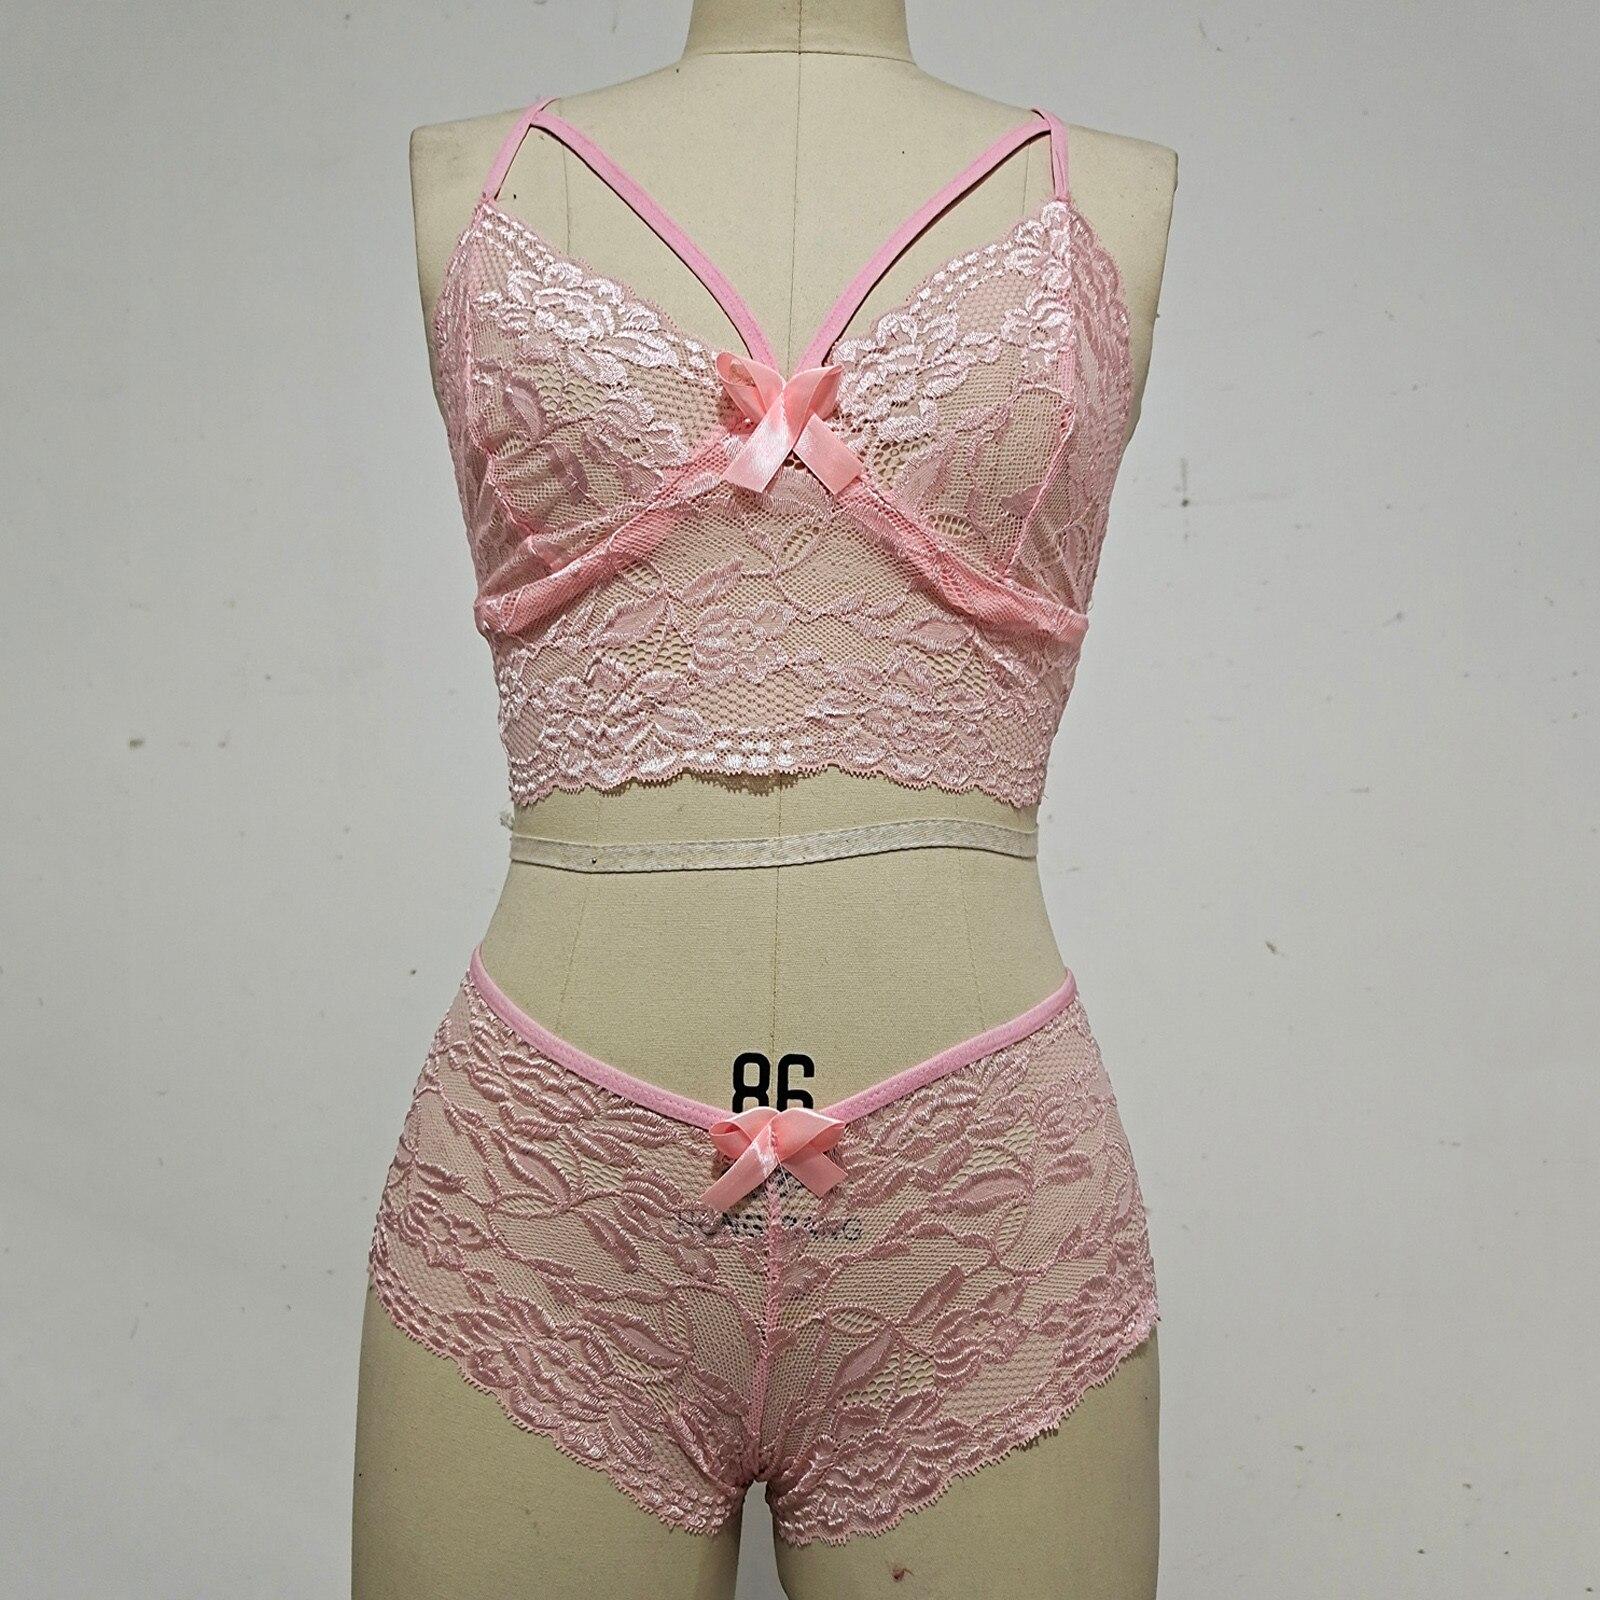 sexy bikini set Women Plus Size Lingerie Corset Lace Floral Bra Two Piece  Underwear beach swimwear